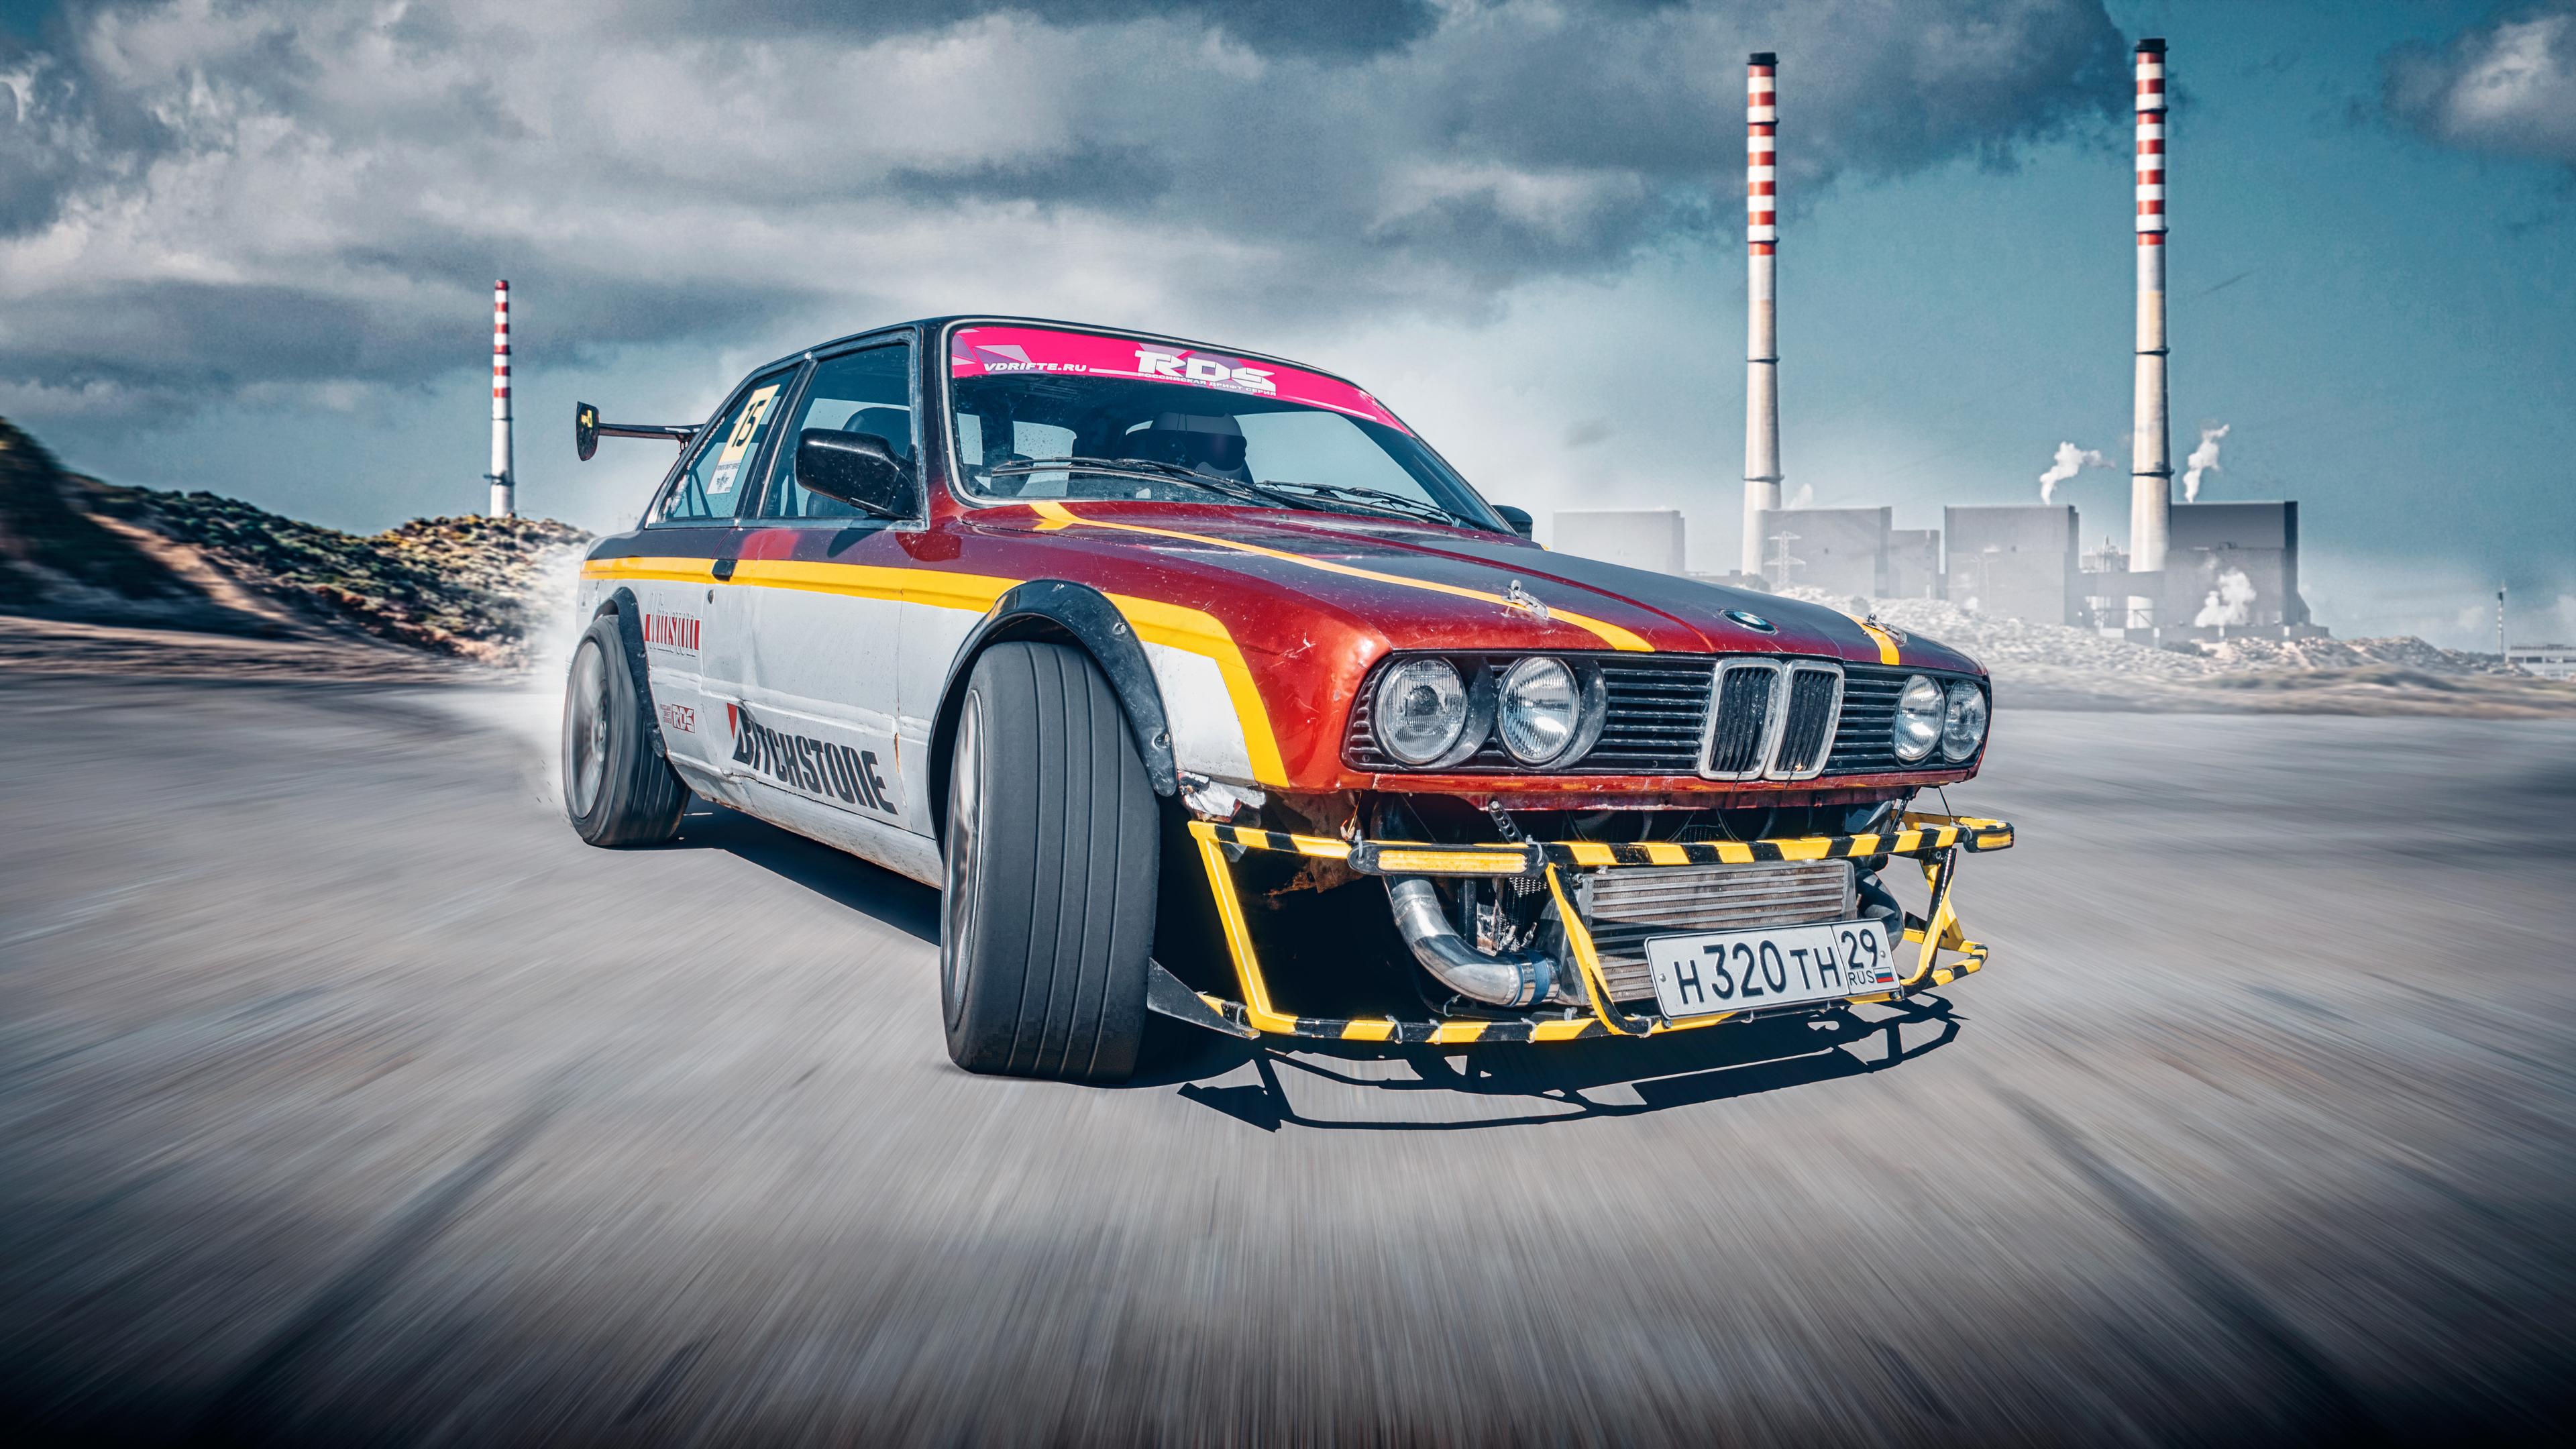 bmw 3 series e30 drifting 1569188820 - BMW 3 Series E30 Drifting - hd-wallpapers, drifting cars wallpapers, cars wallpapers, bmw wallpapers, 5k wallpapers, 4k-wallpapers